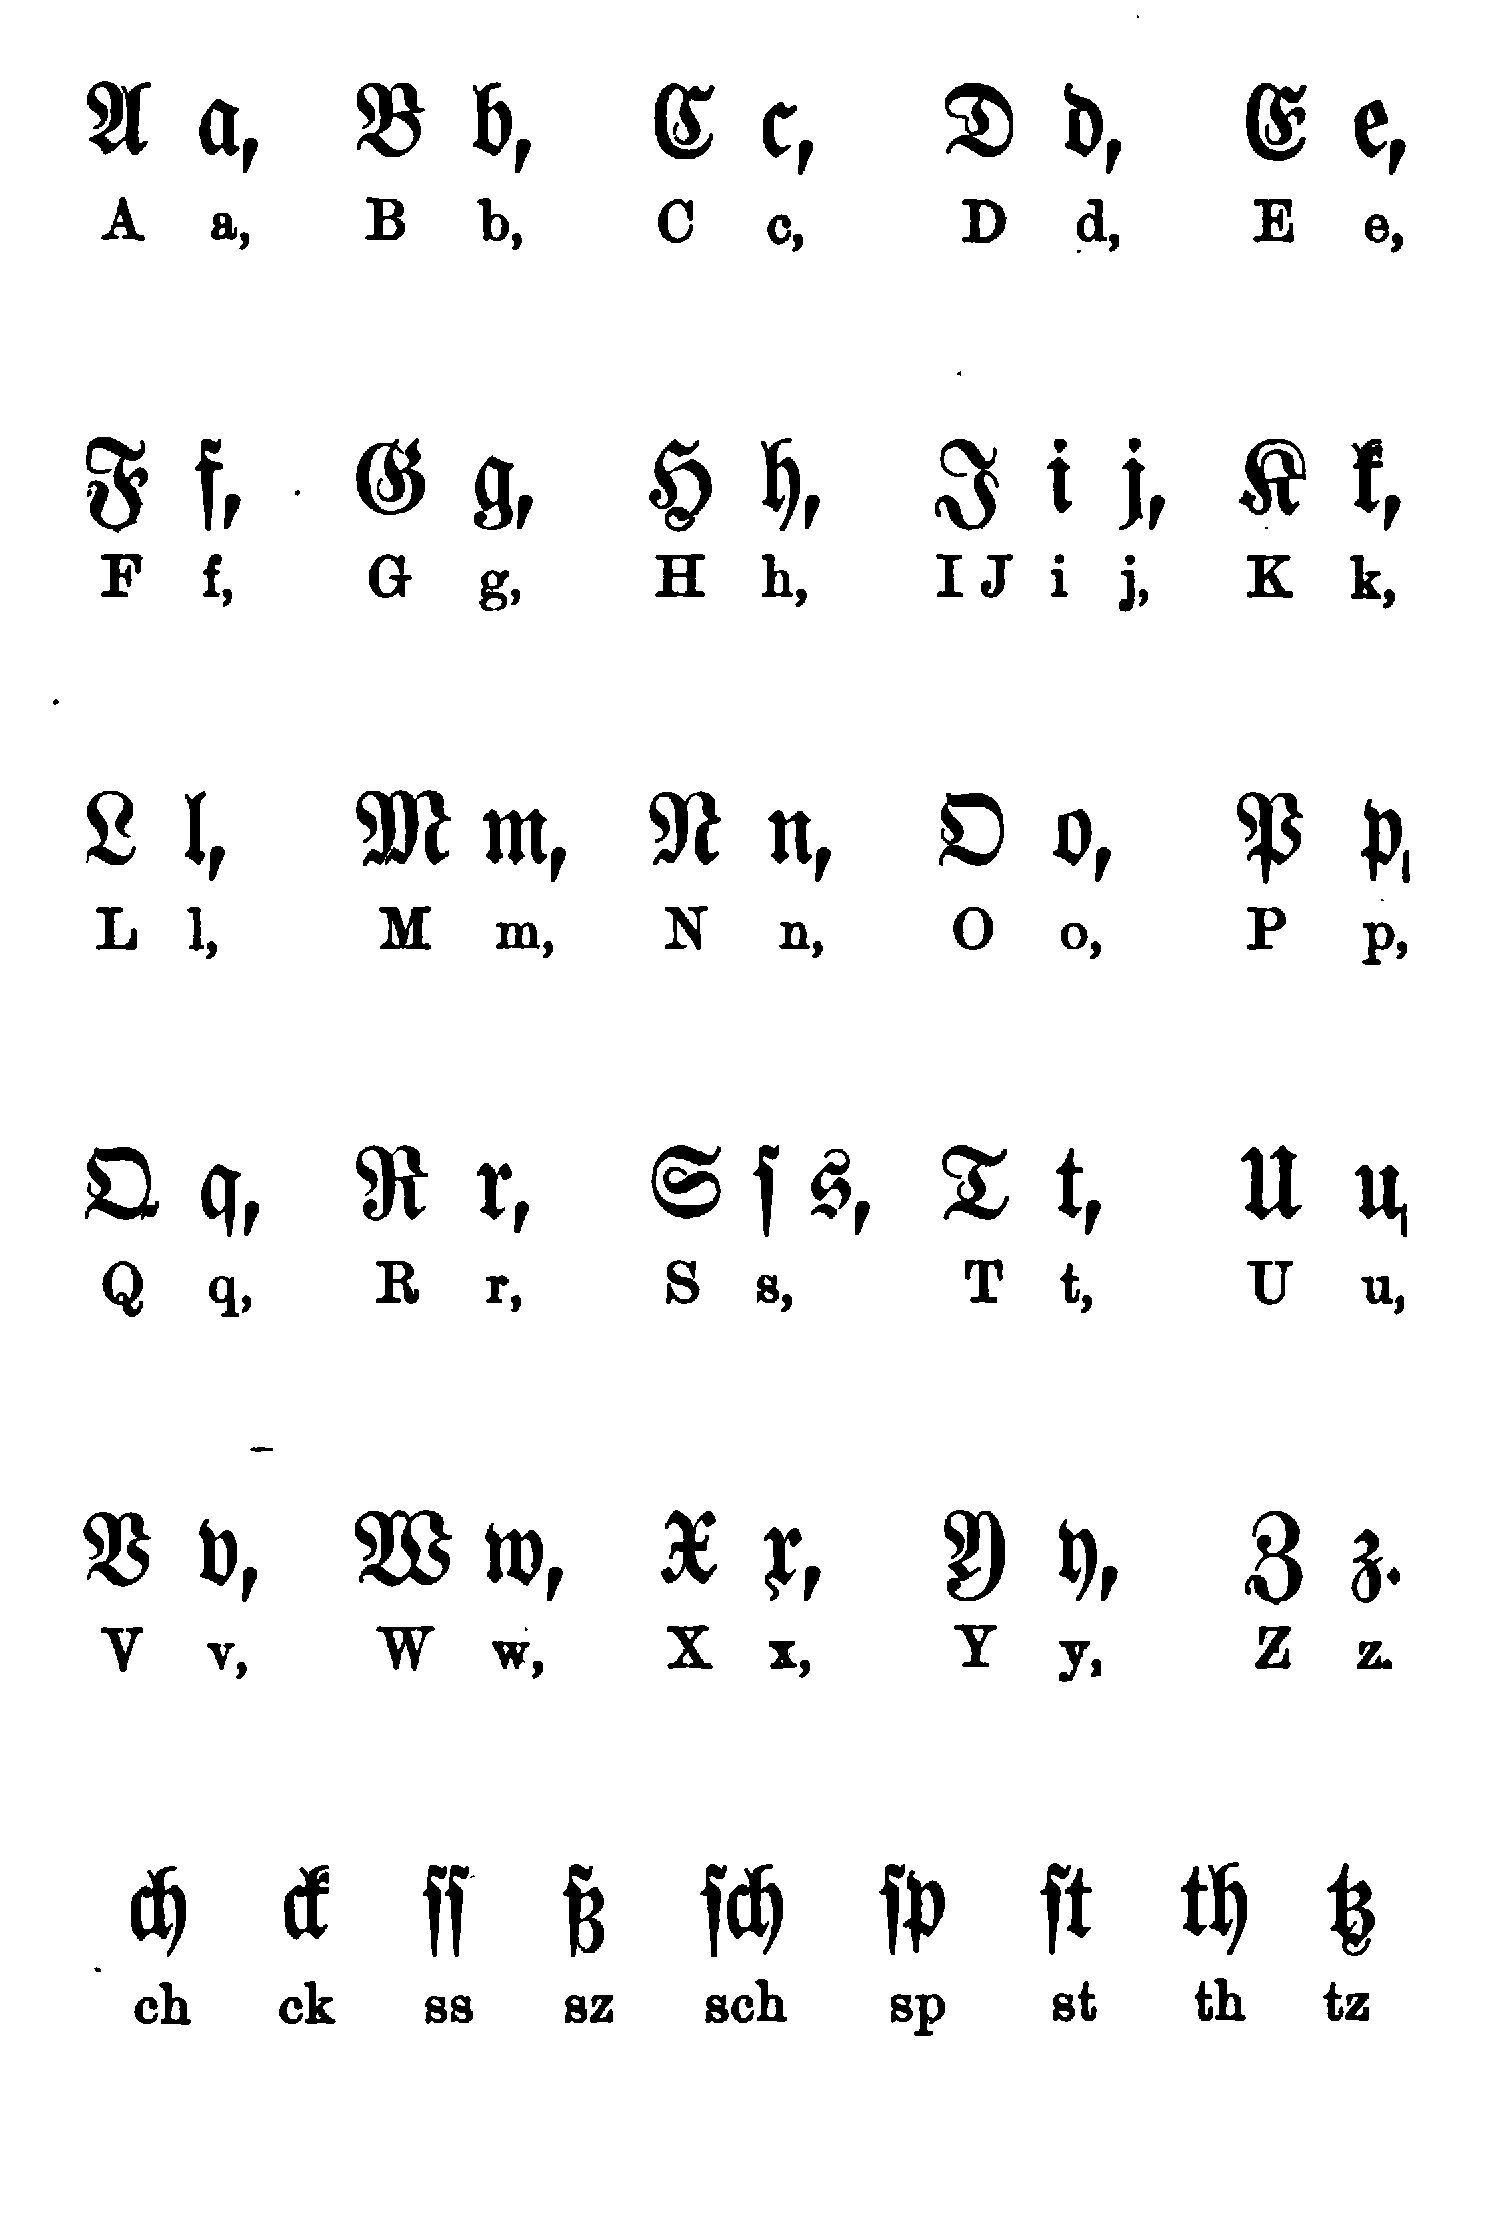 Bestand Lesehilfe Fraktur Jpg Wikipedia Frakturschrift Altdeutsche Schrift Alphabet Schrift